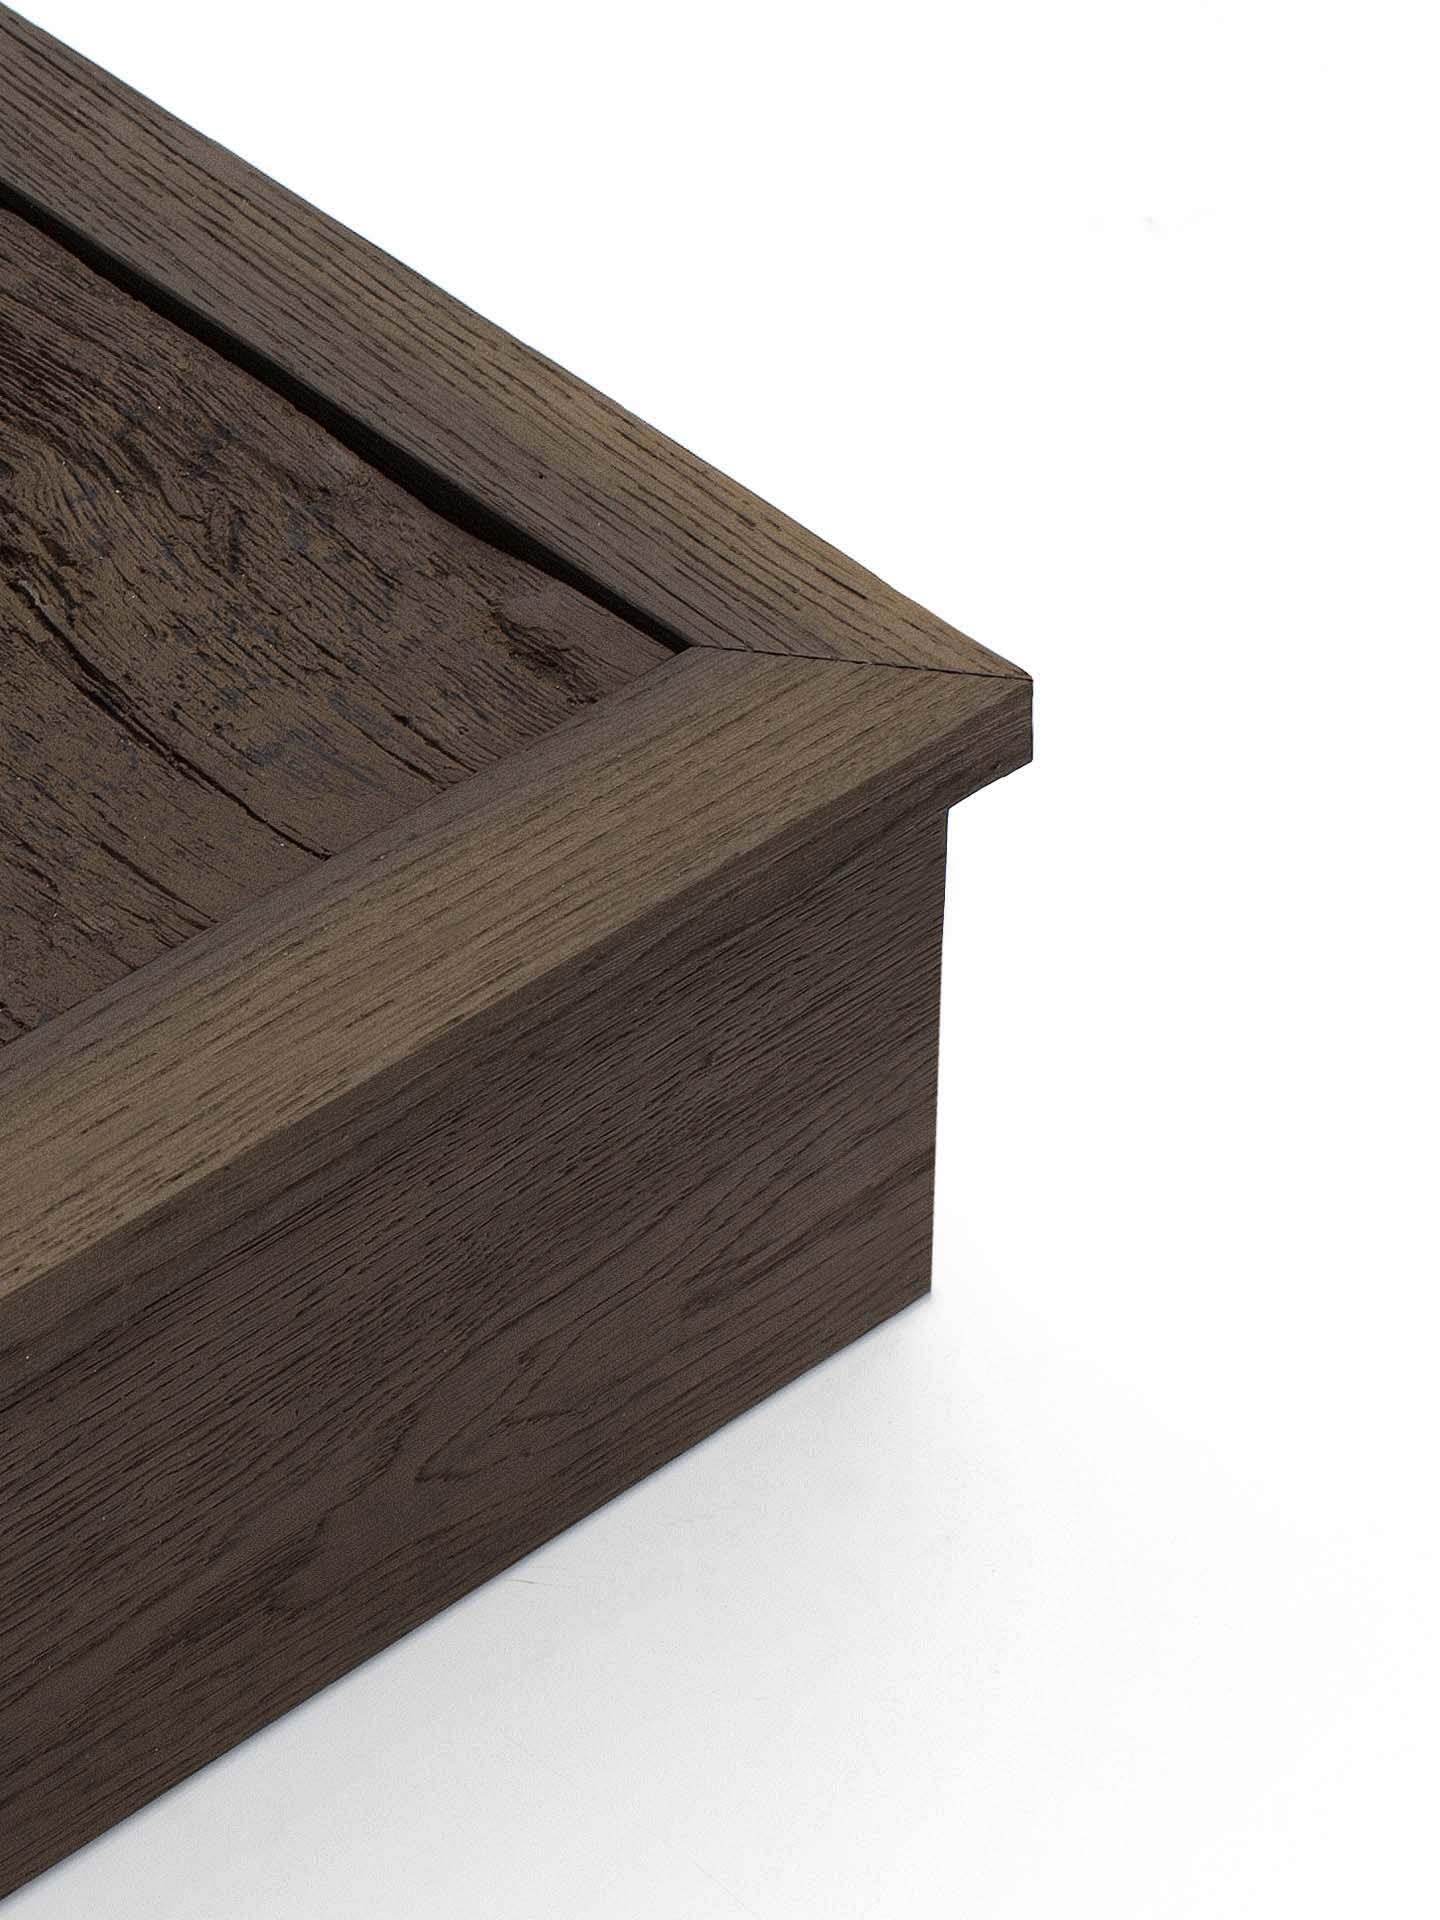 CarréVierkanSquare - 50 x 3200 x 33 mm2,67 kg / planche50 x 3200 x 33 mm2,67 kg/plank50 x 3200 x 33 mm2.67 kg / board